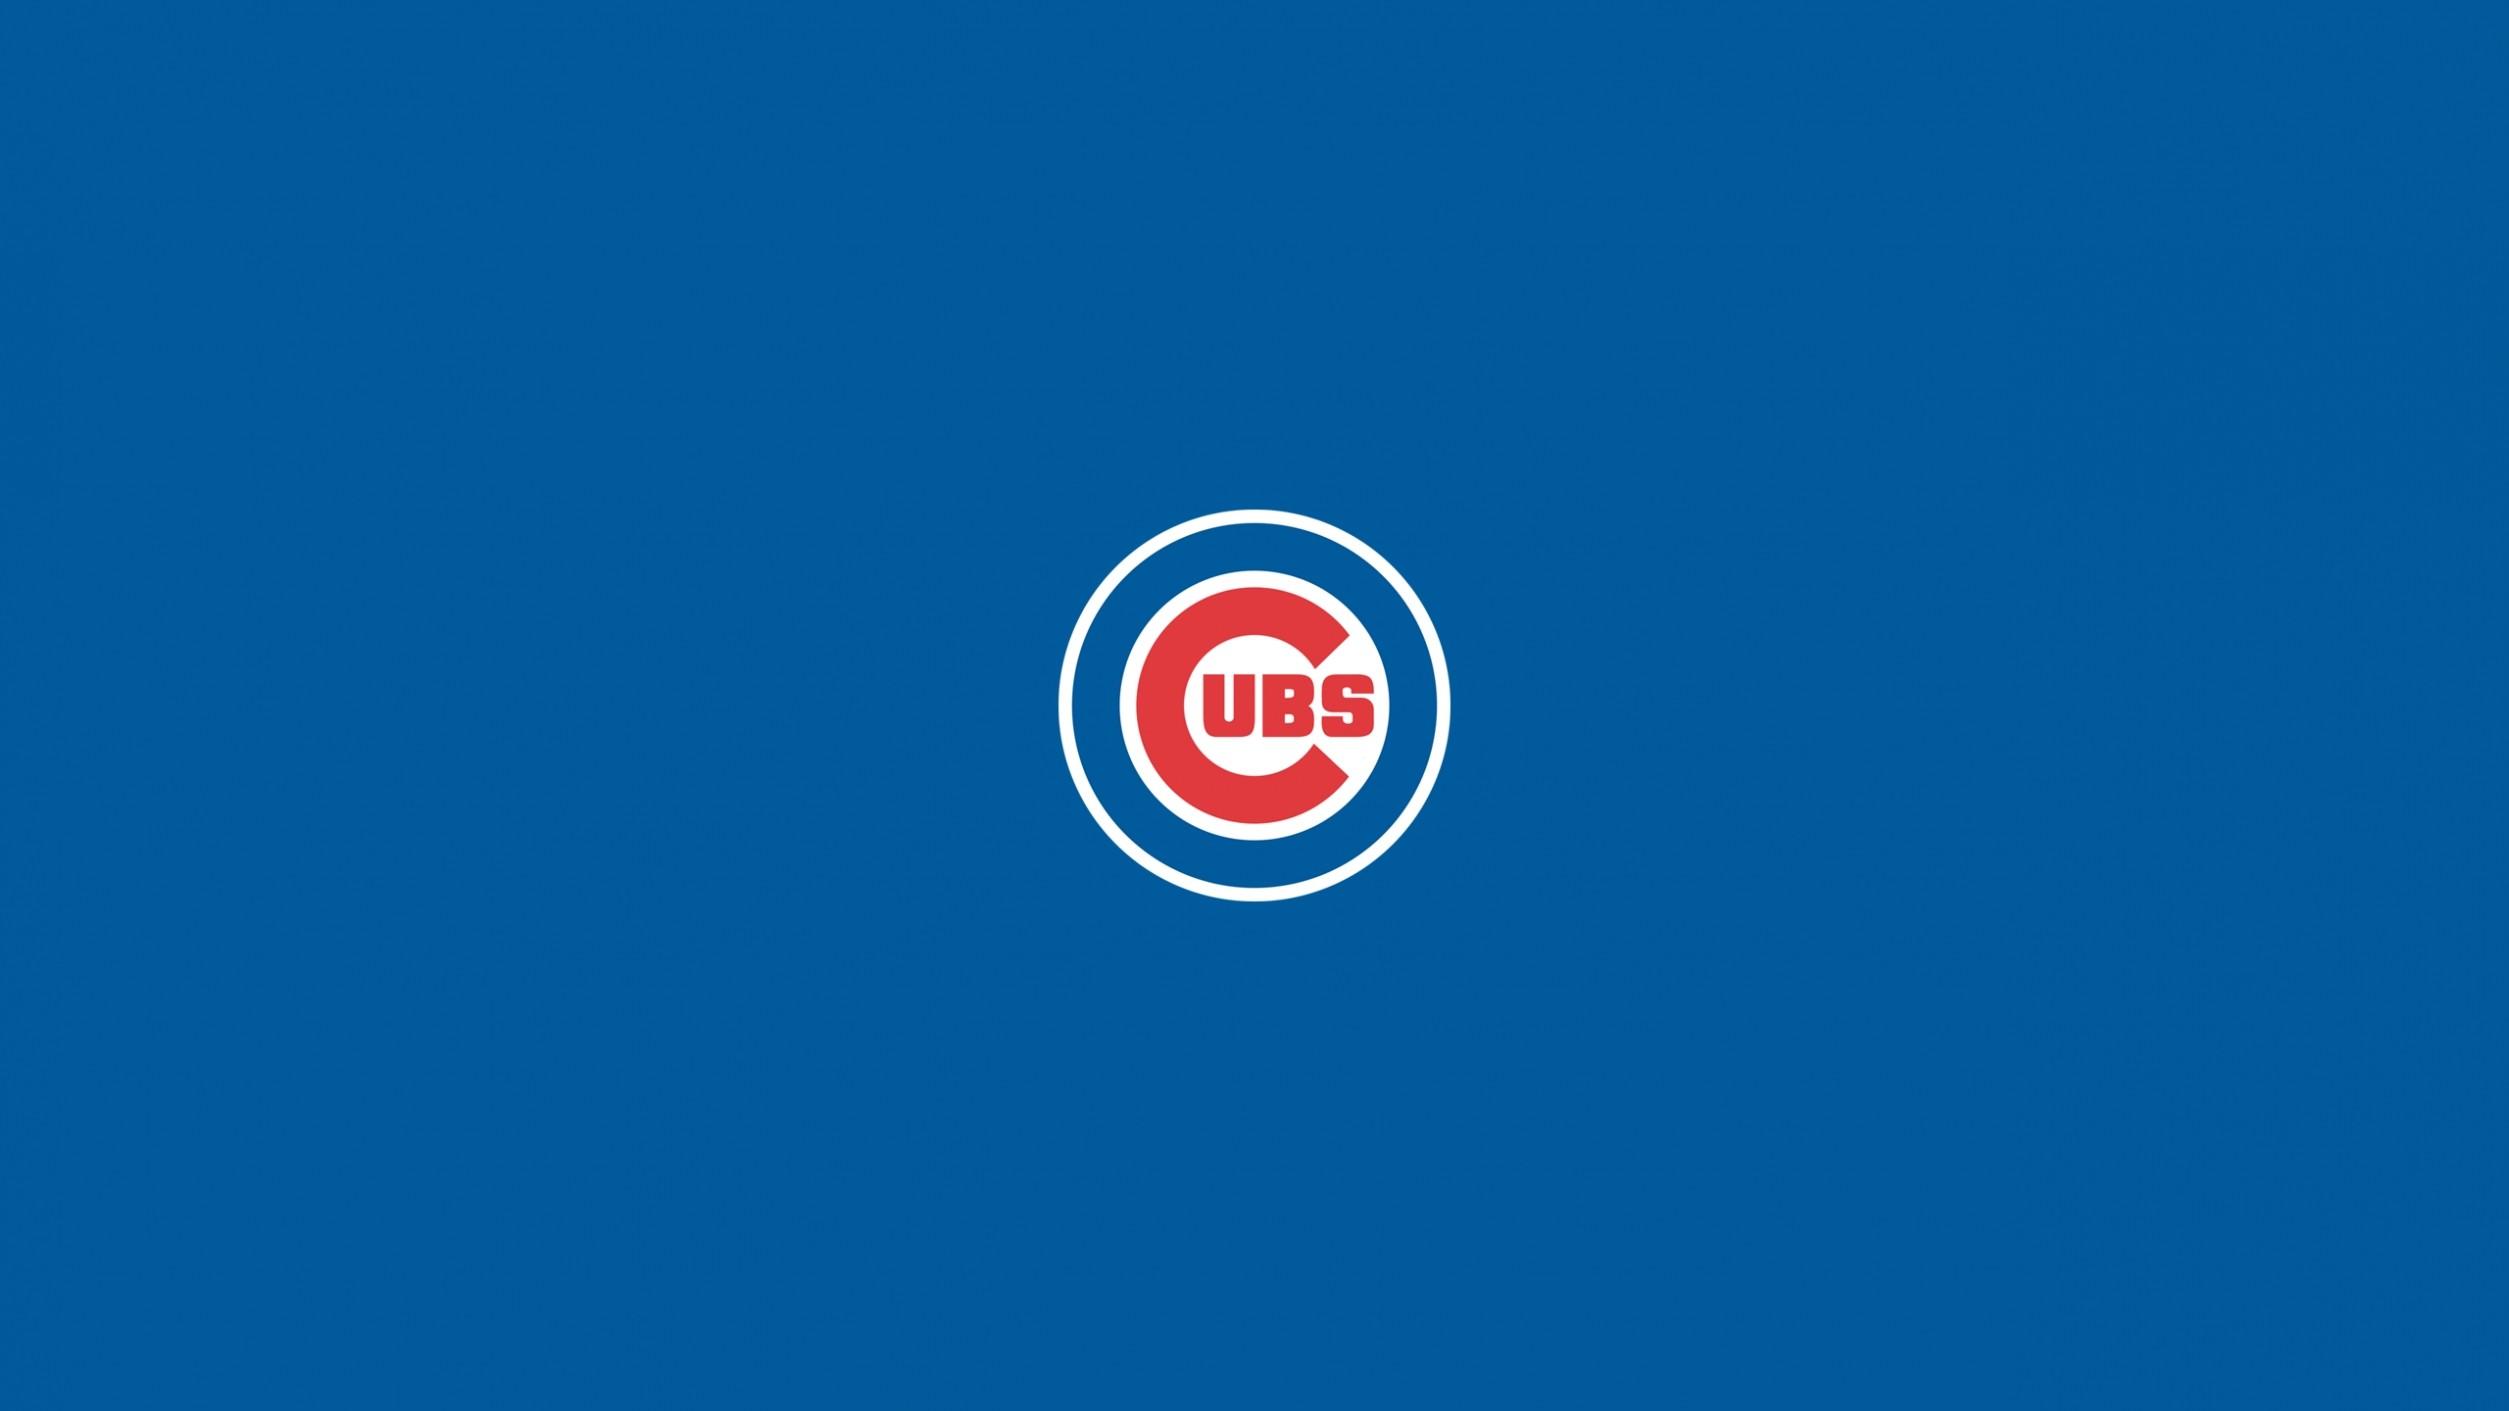 … Awsome Chicago Cubs Wallpaper Background throughout Chicago Cubs  Wallpaper …